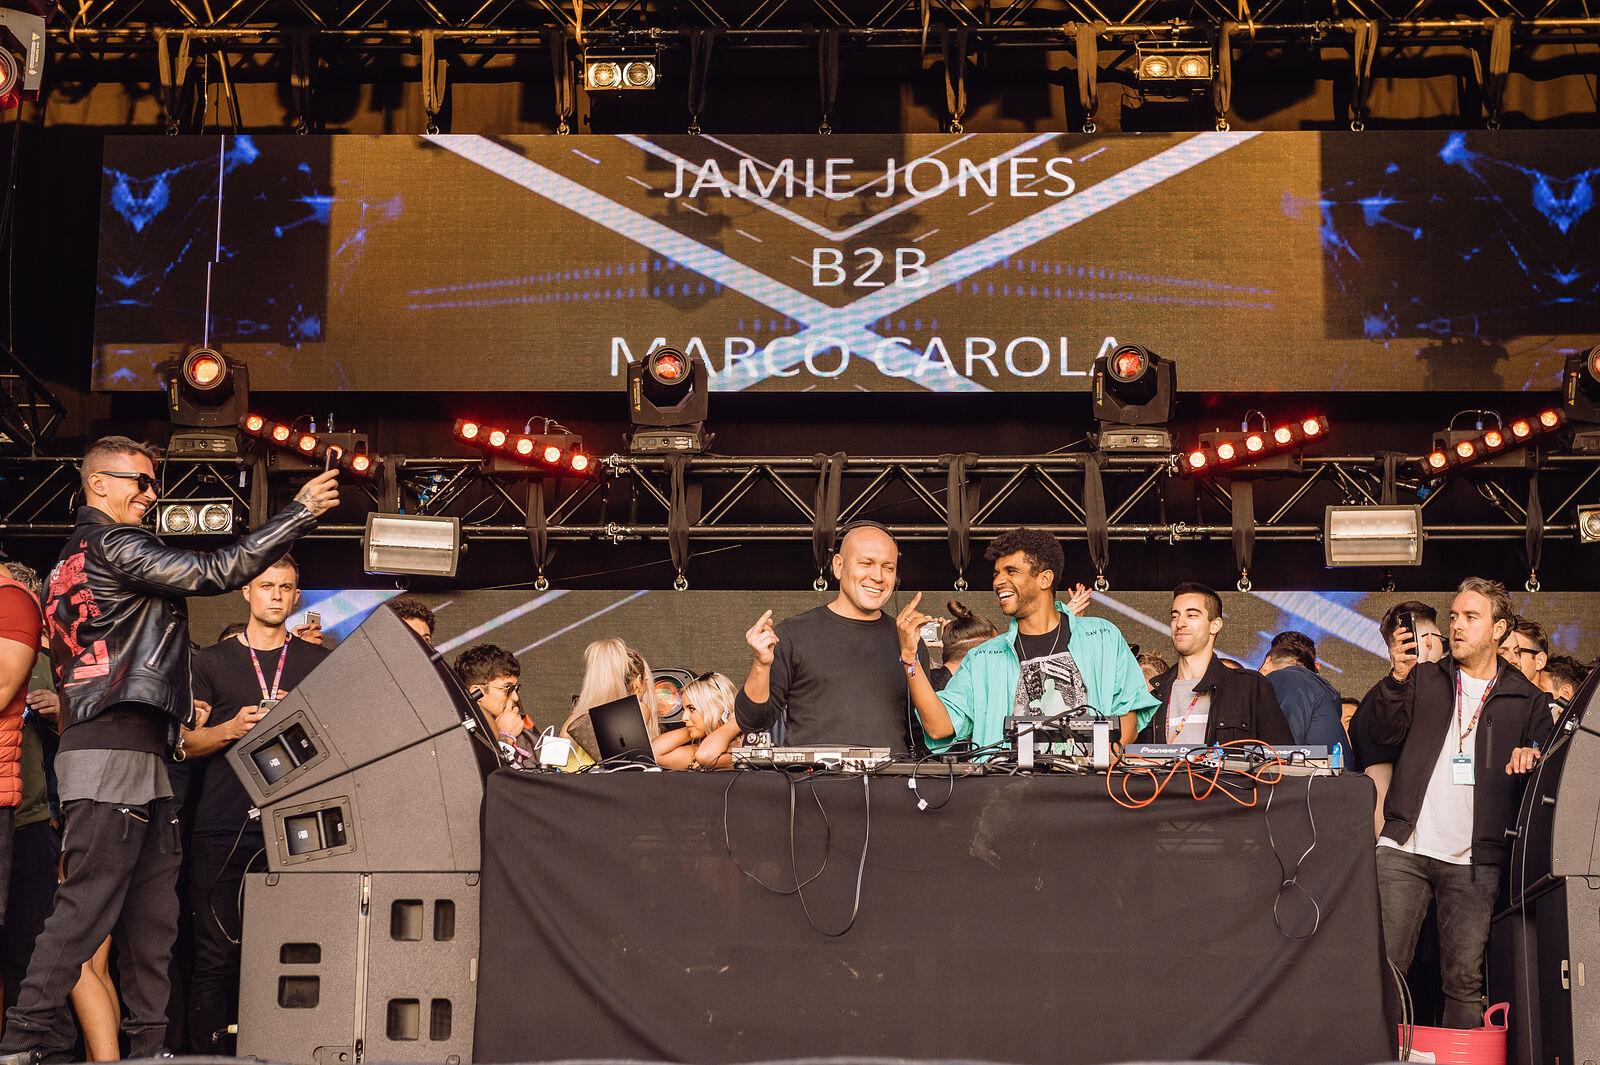 Jamie Jones b2b Marco Carola